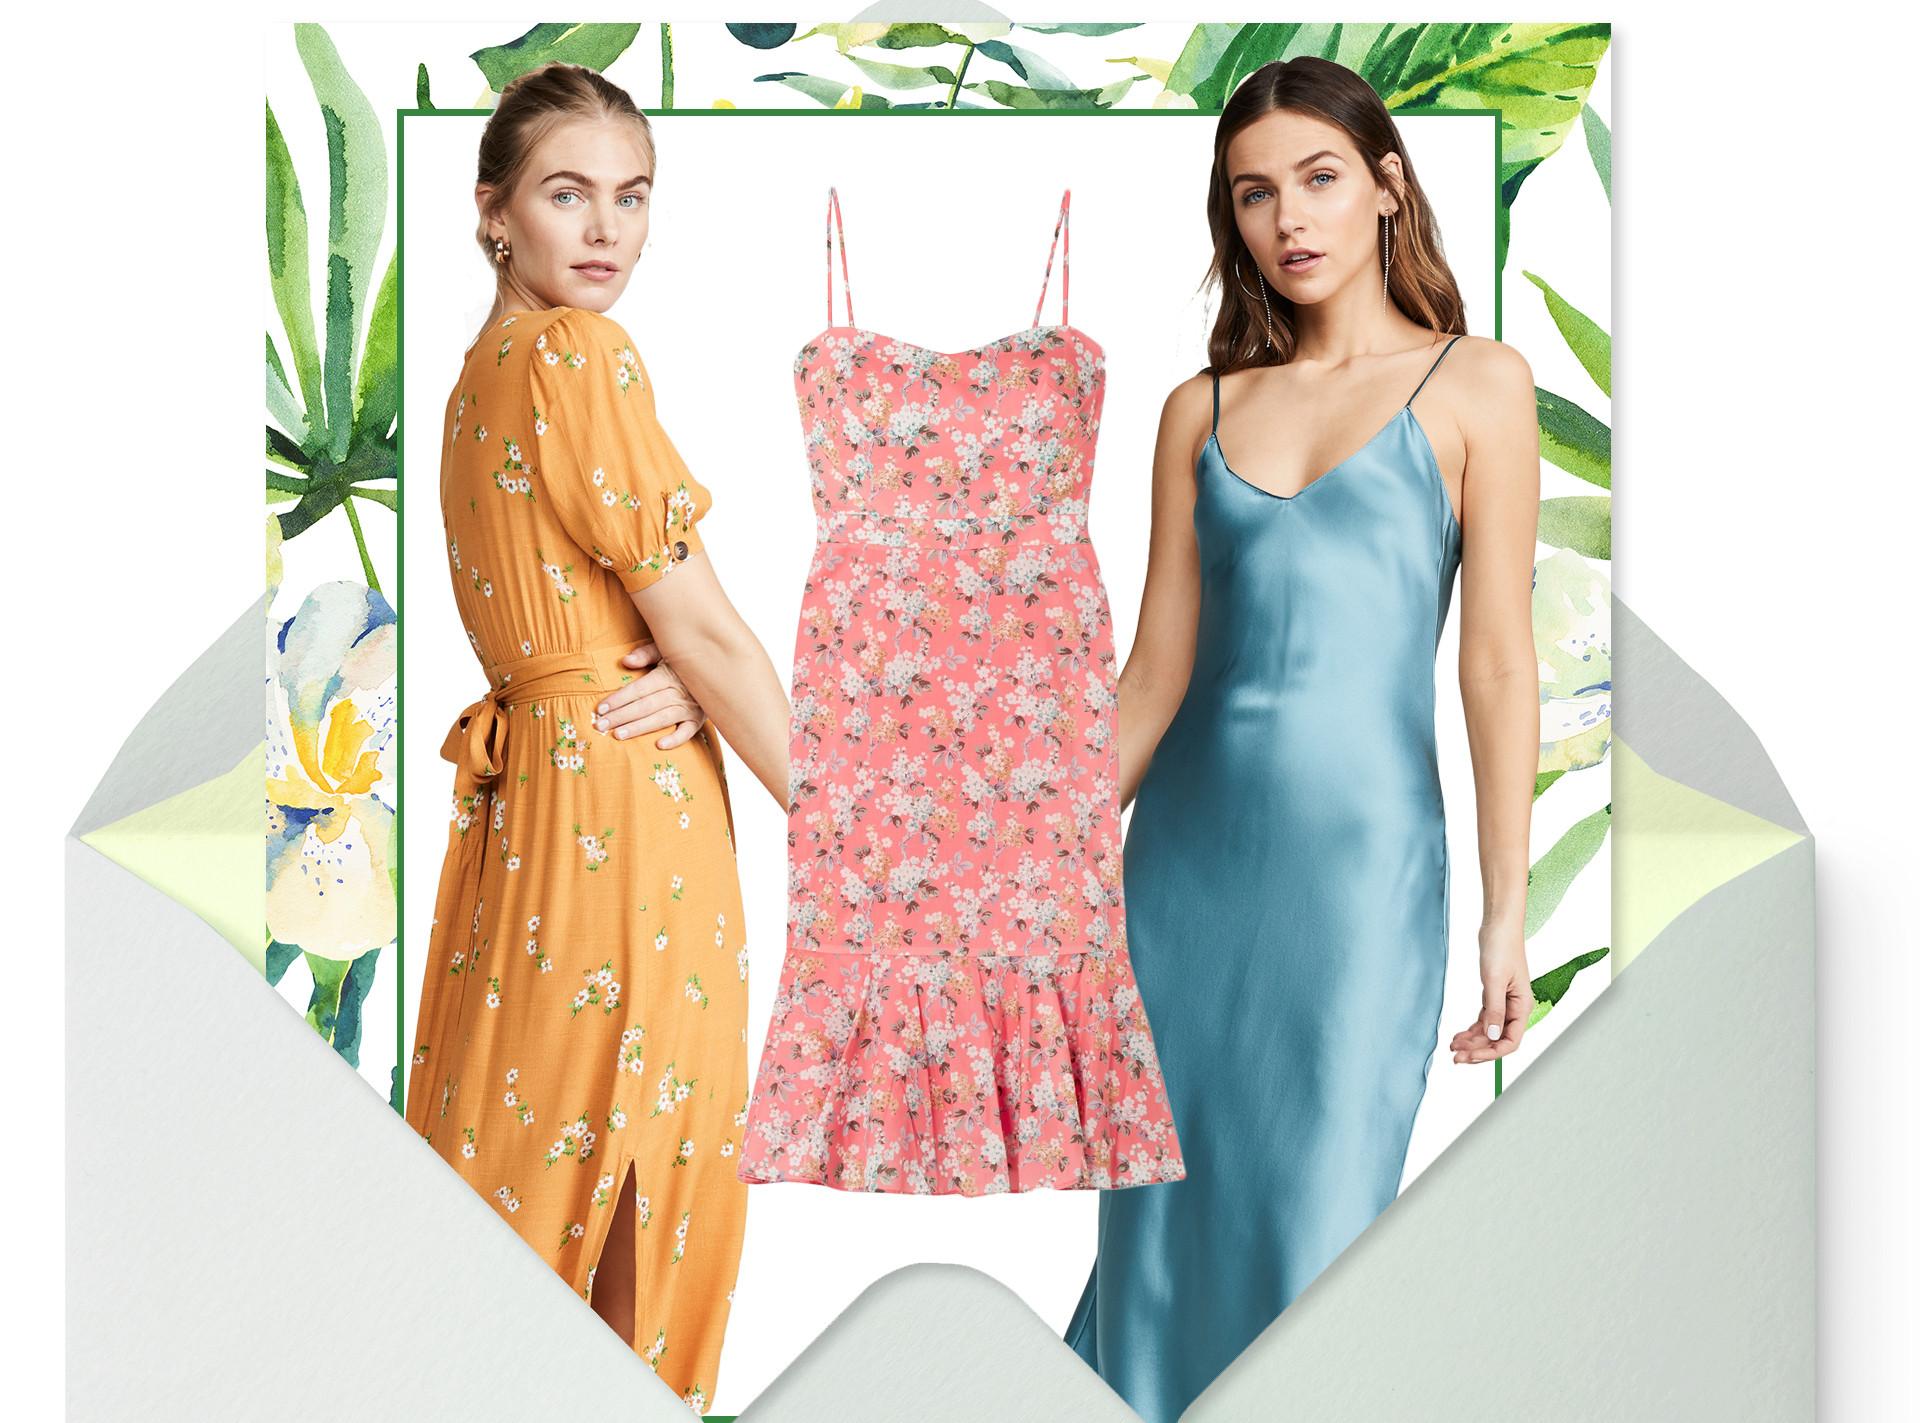 Summer Wedding Guest Dresses You'll Wear Forever